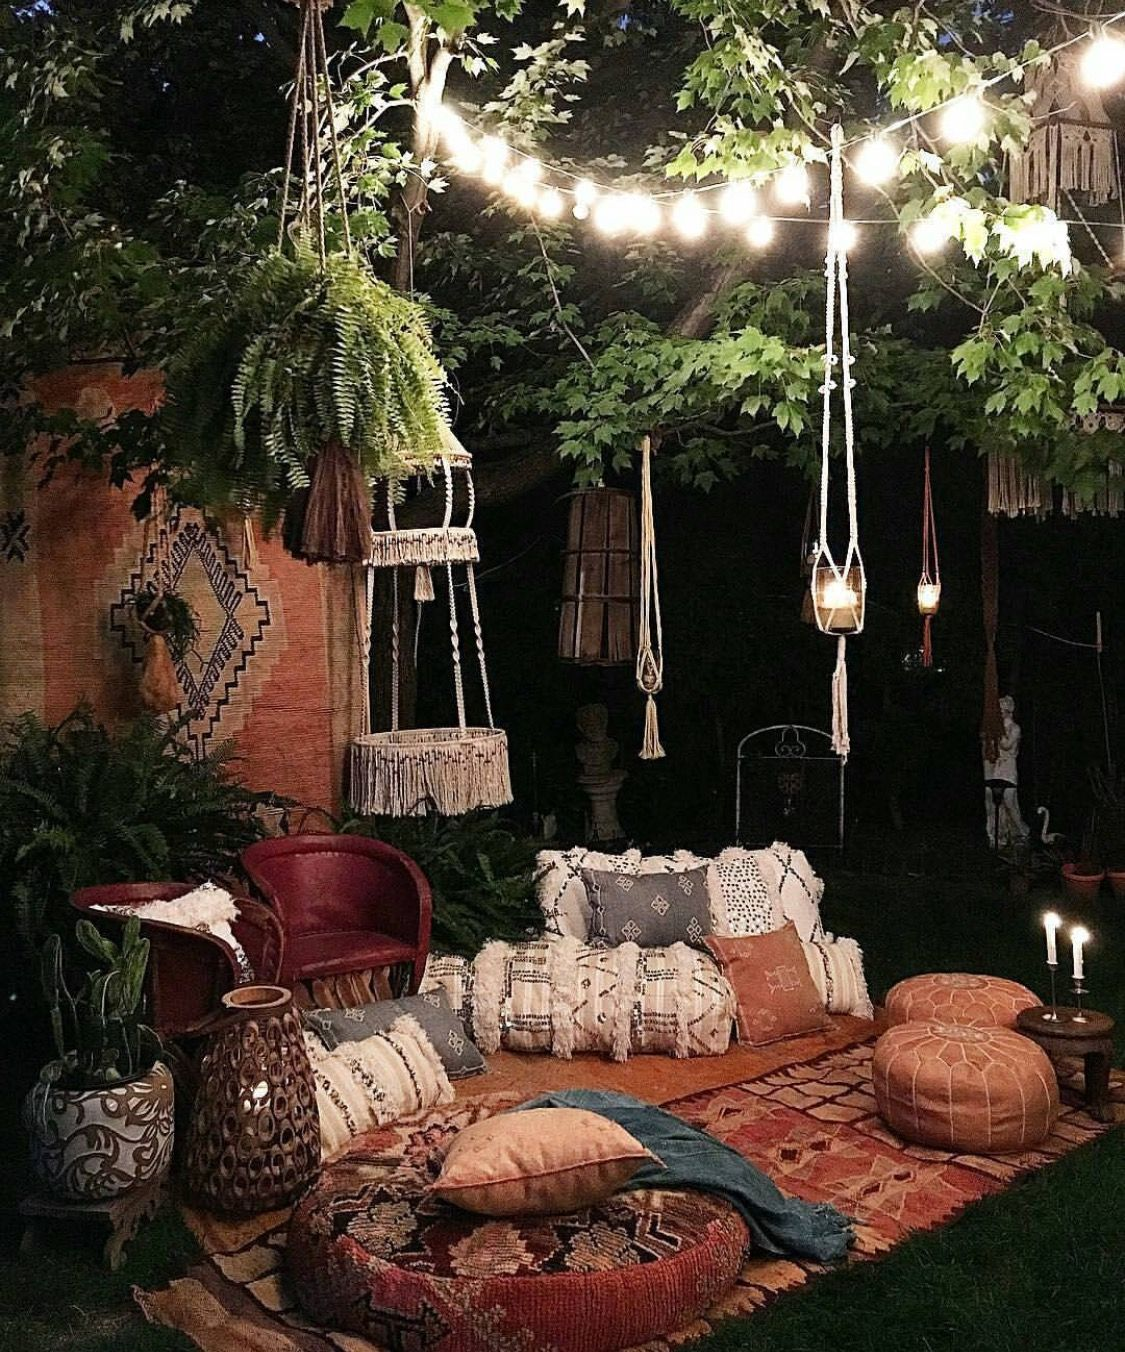 outdoor #decor#nature   Decor ideas! in 2018   Pinterest   Decor ...